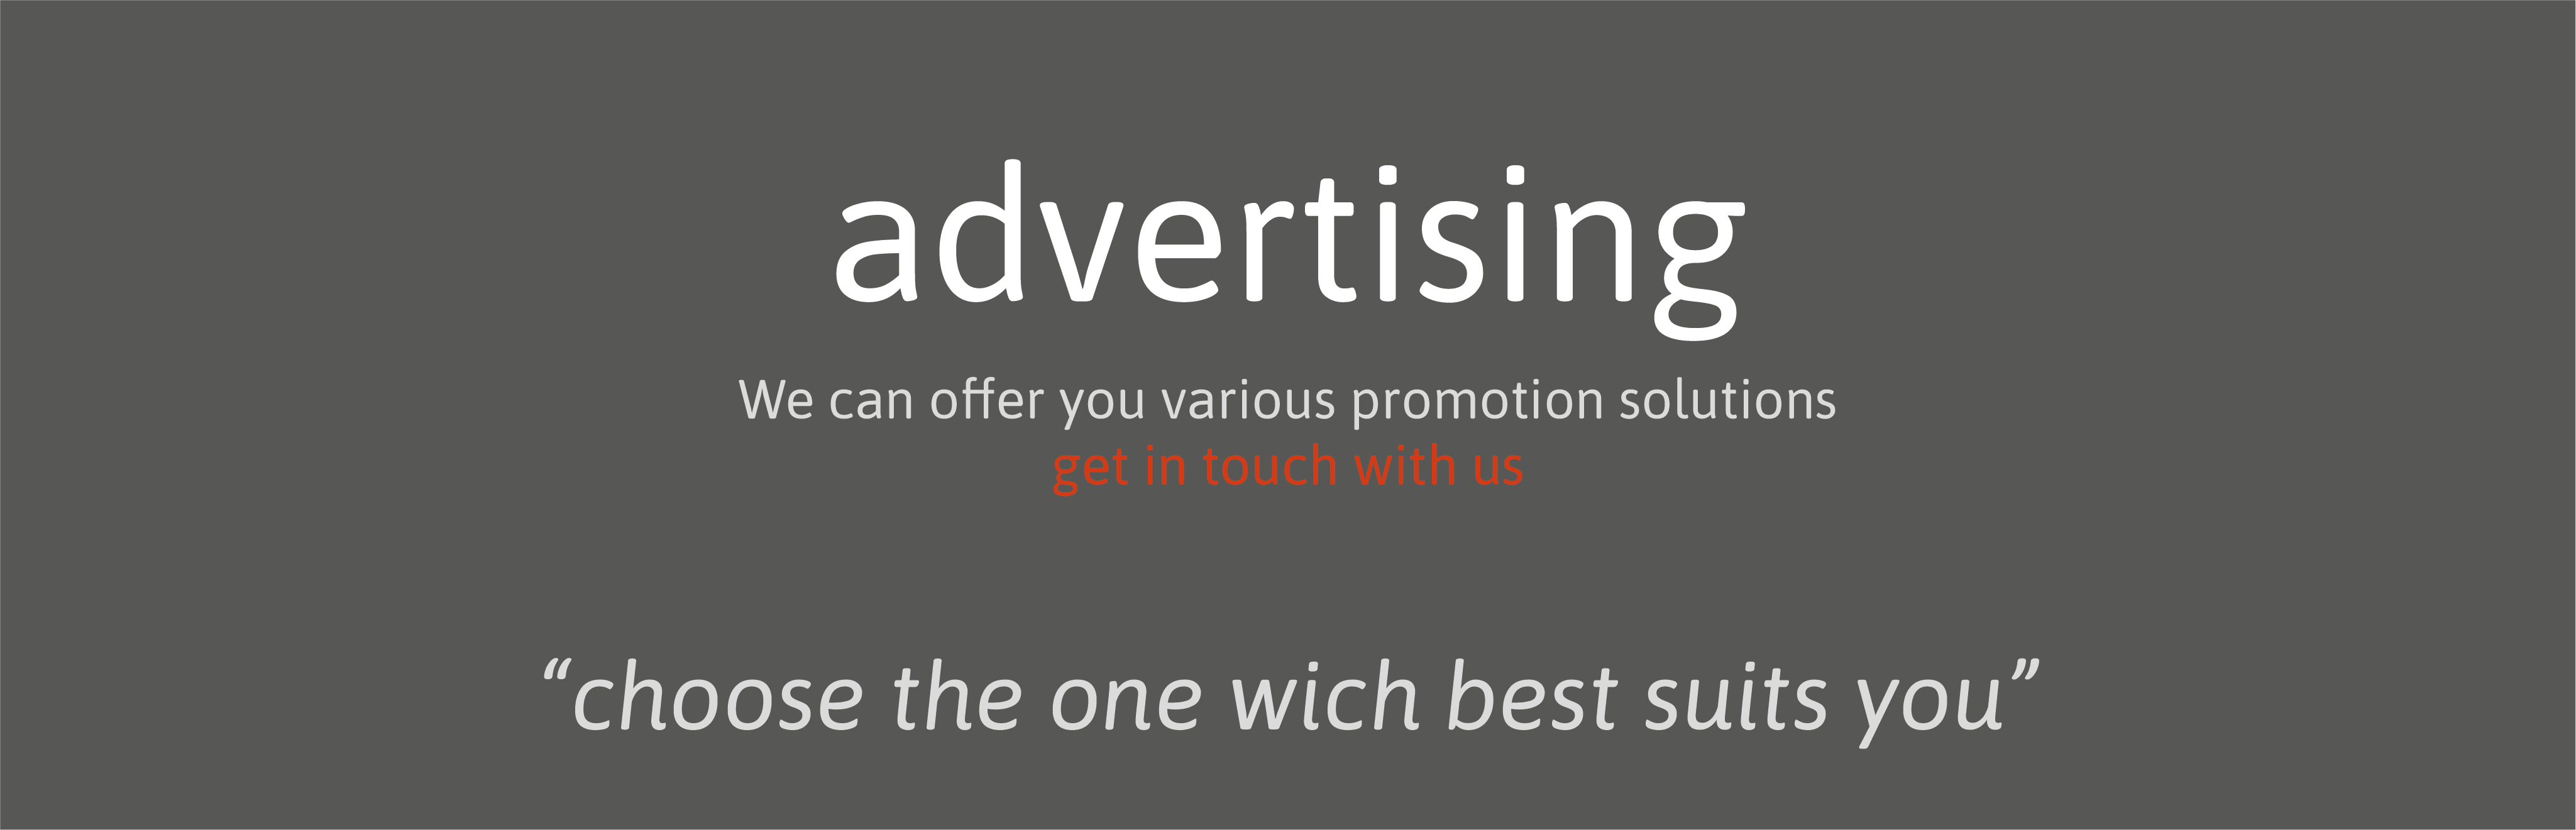 seampedia advertising